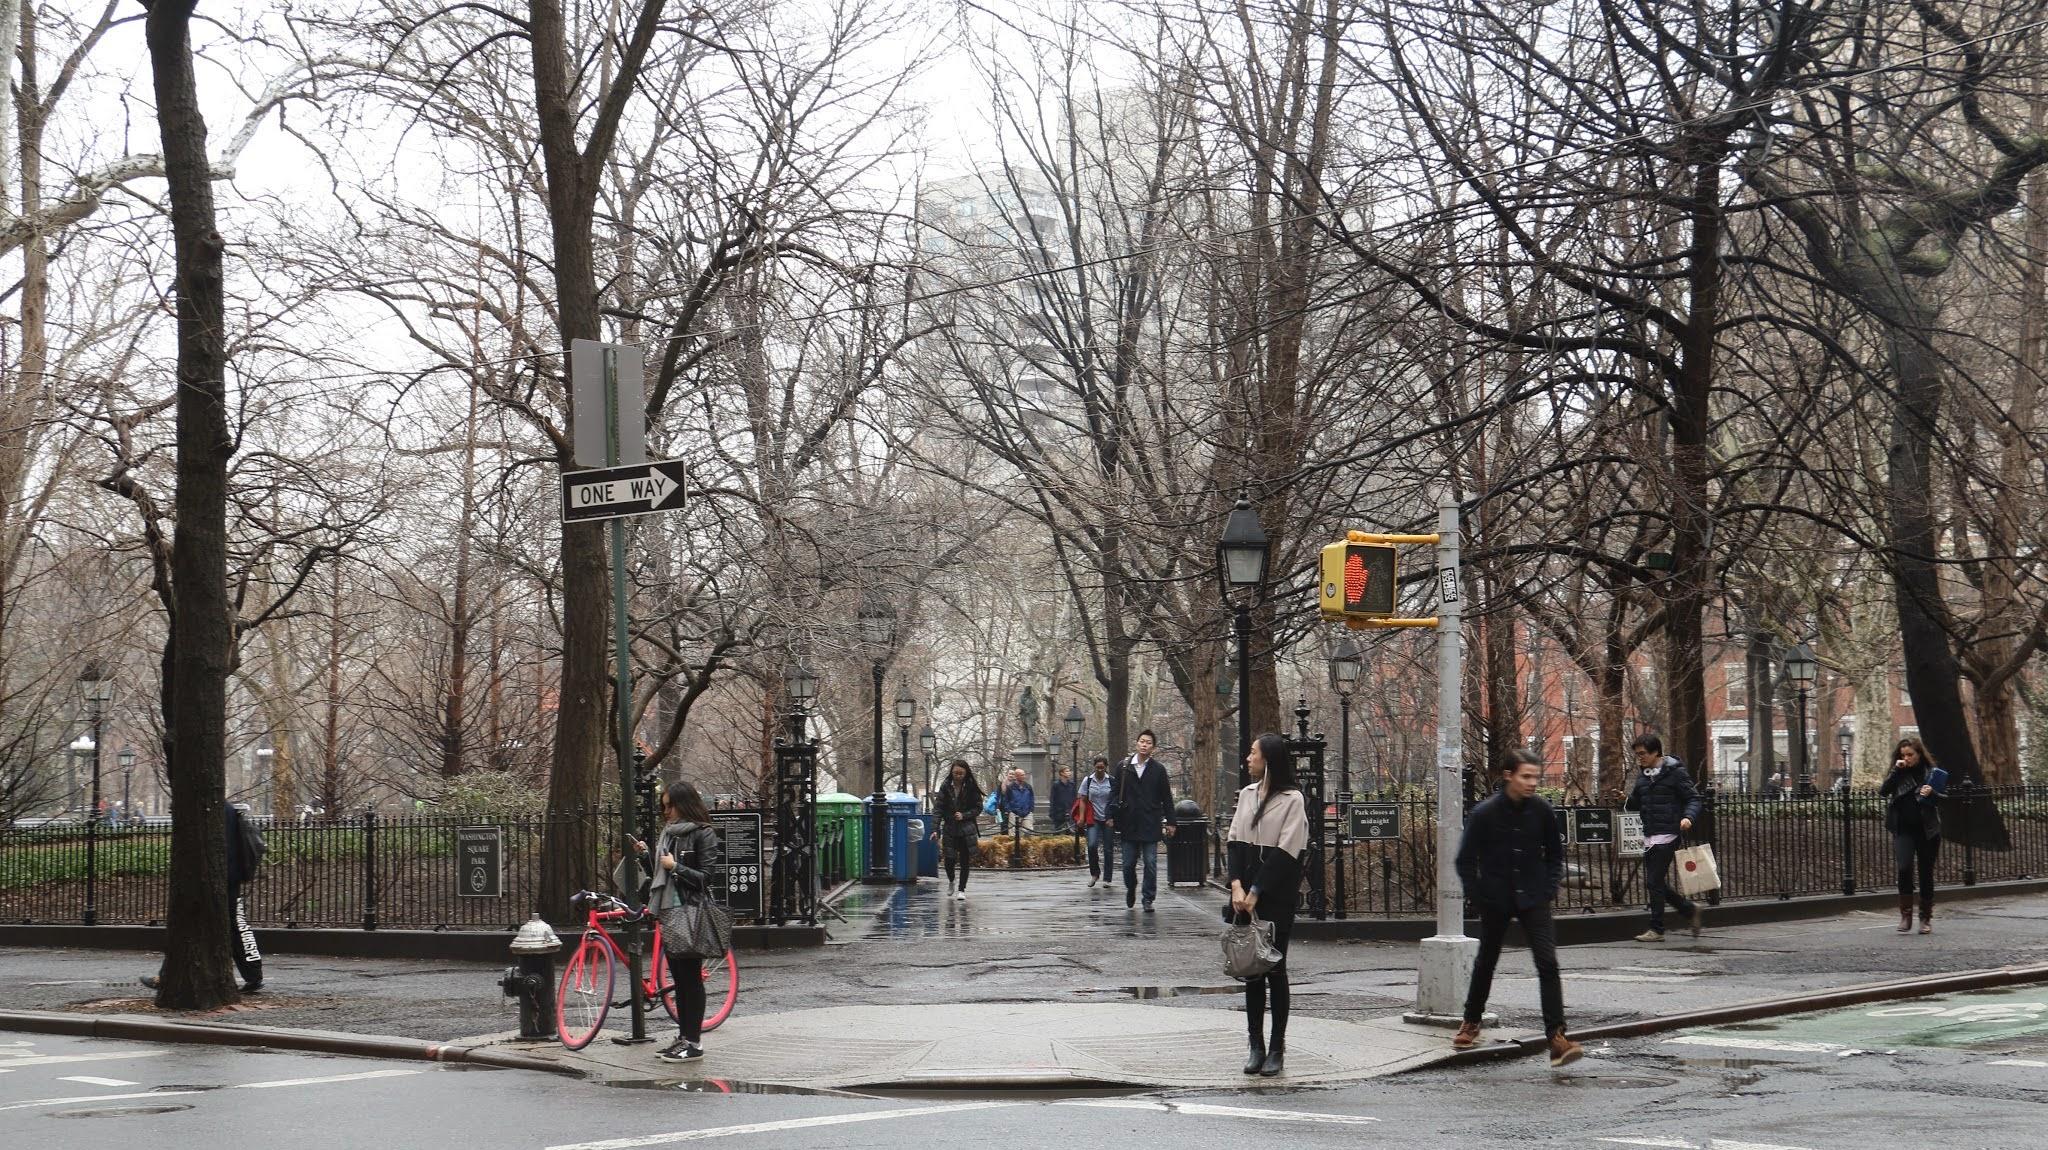 classified closet, new york city, nyu, washington square park